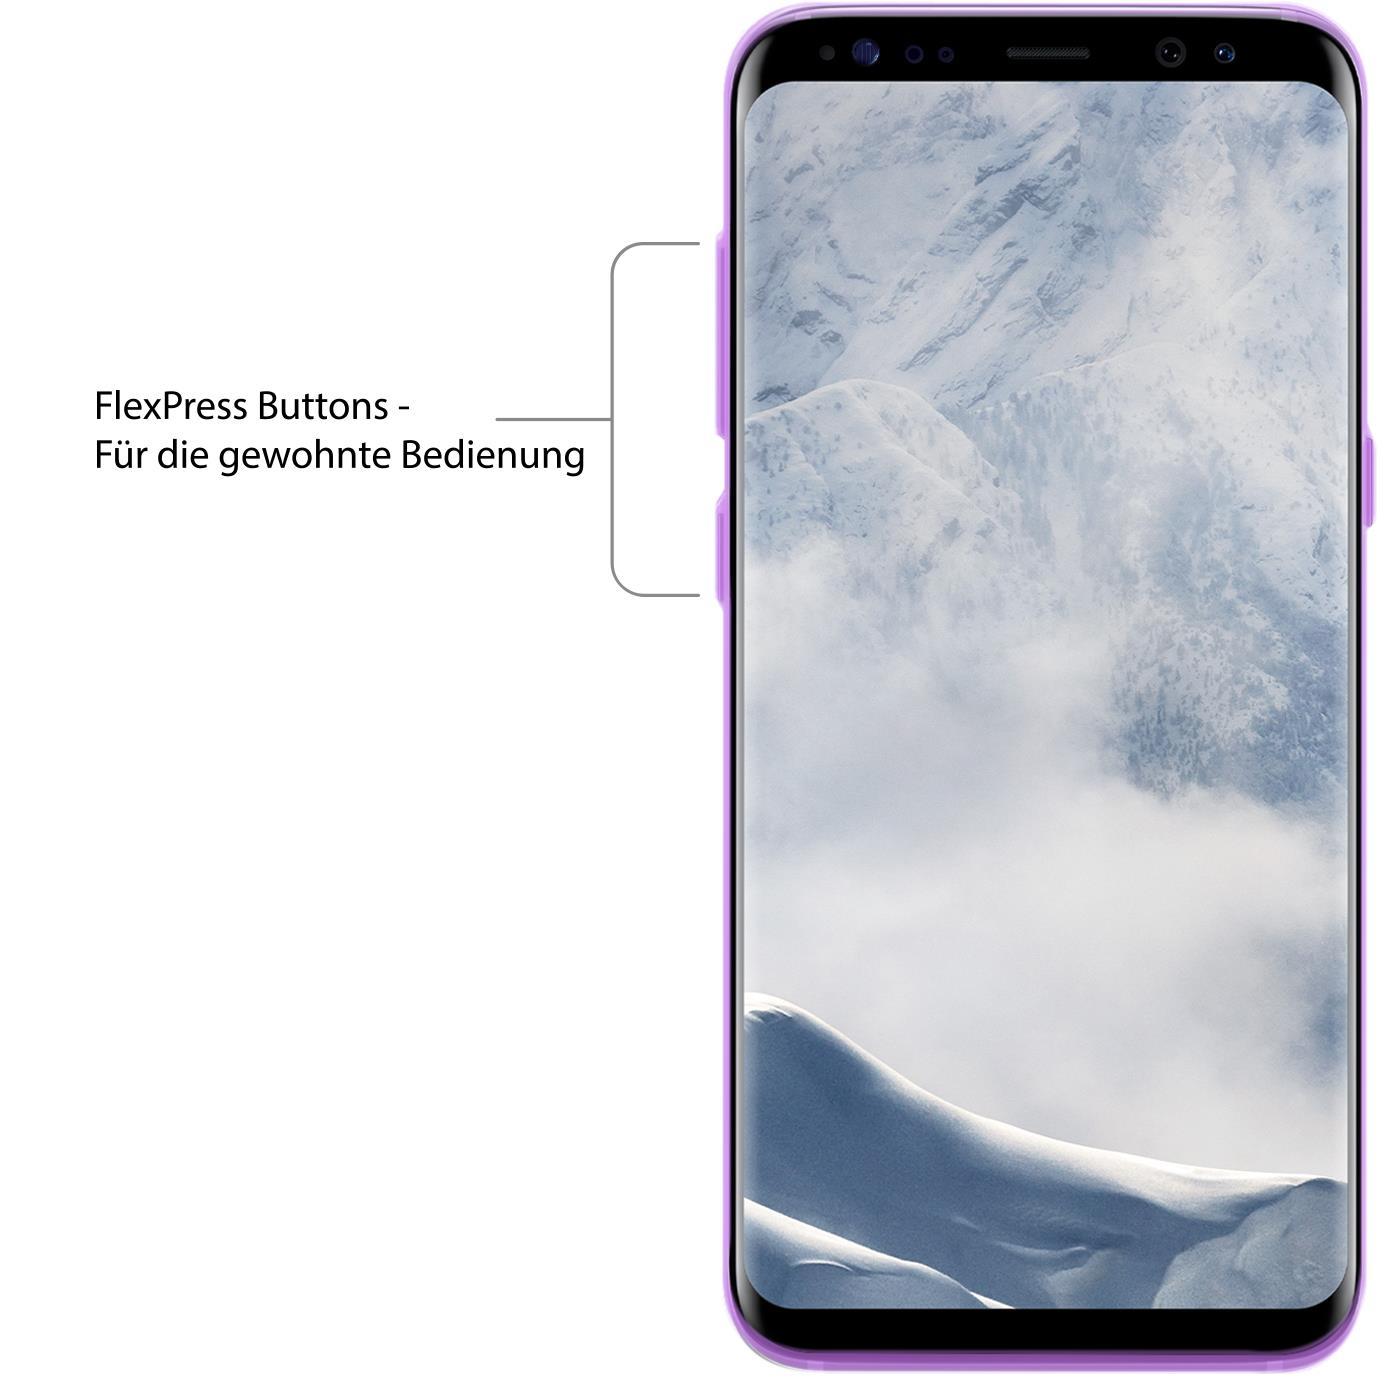 Samsung-Galaxy-s8-Duenn-Silikon-Klar-Case-Cover-Ultra-Slim-Stossfeste-Gel-Rueckseite Indexbild 22